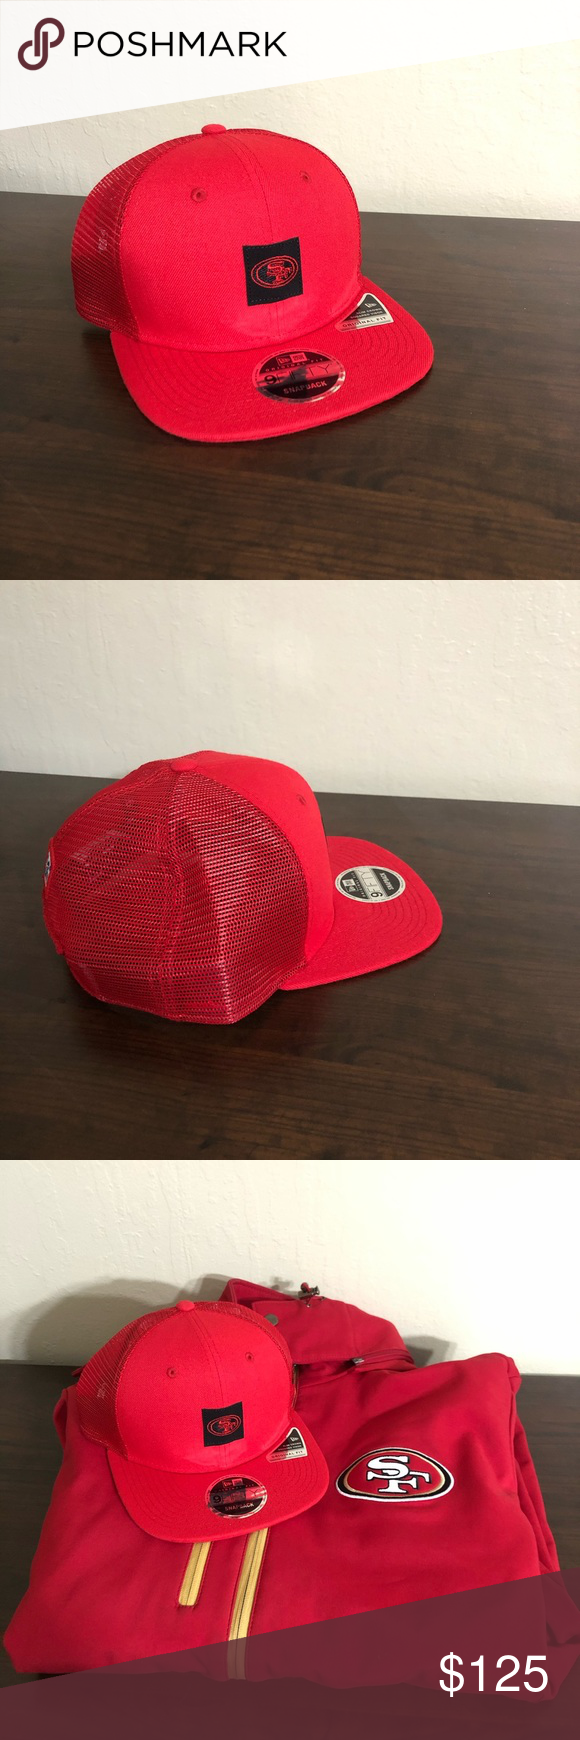 kyle shanahan hat red